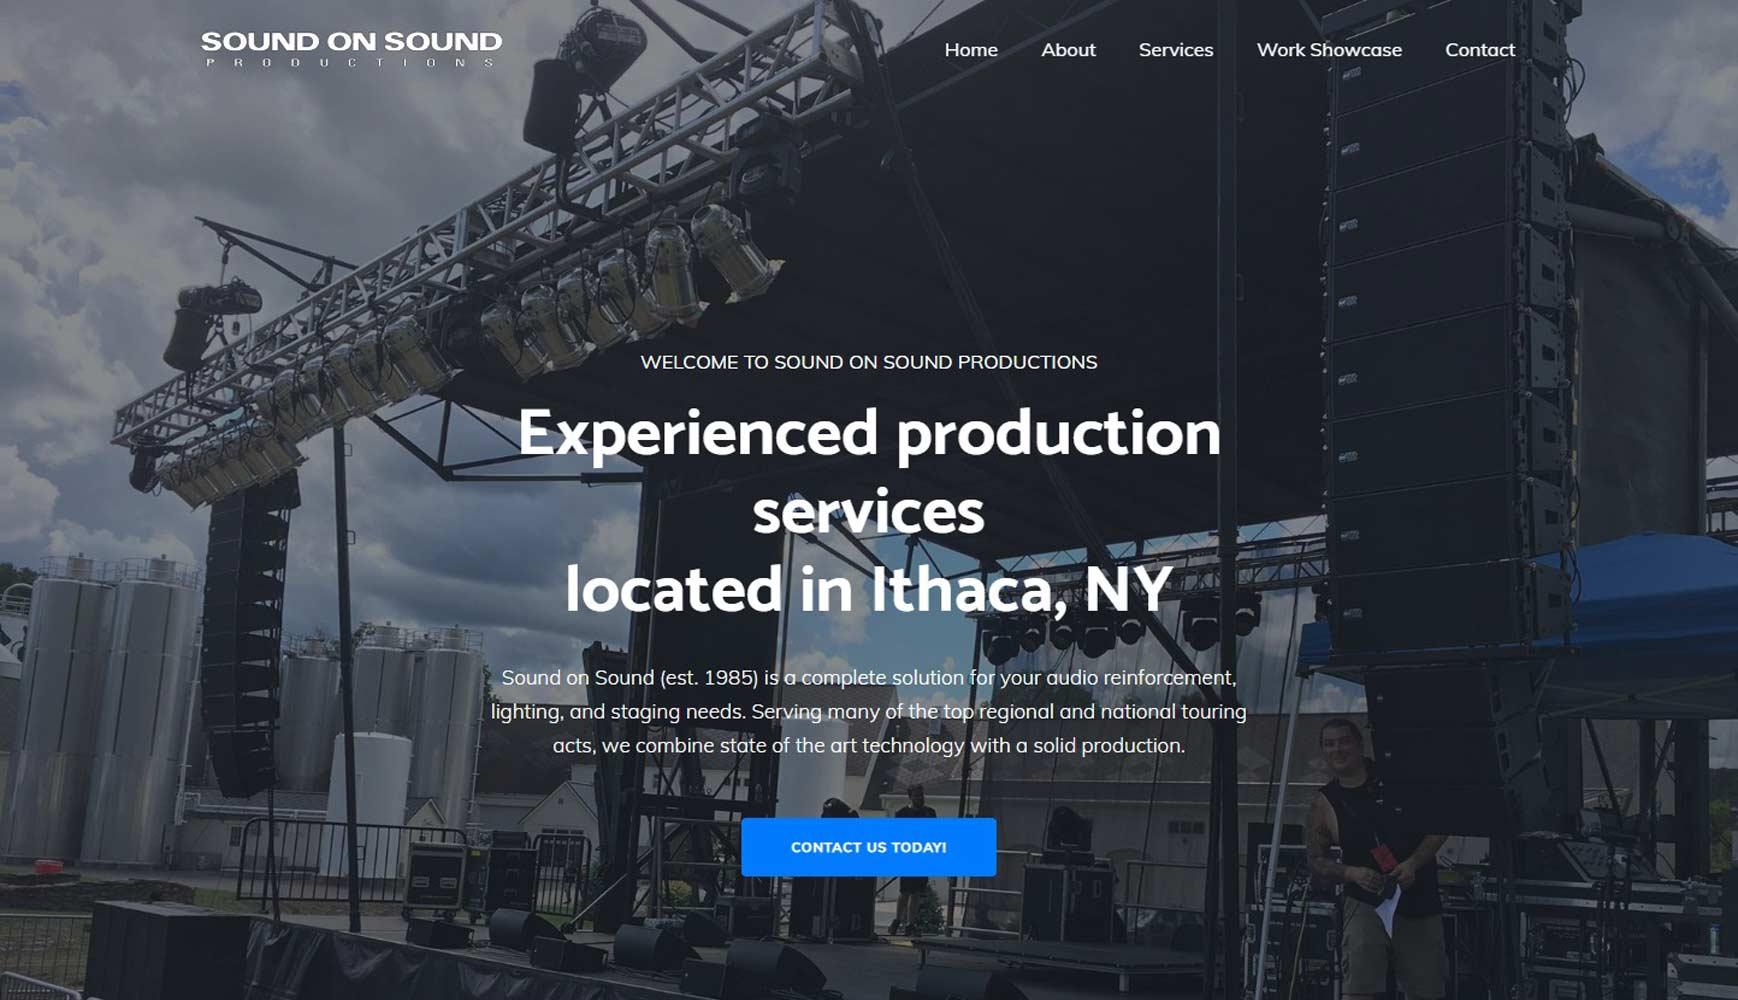 Sound on Sound Productions